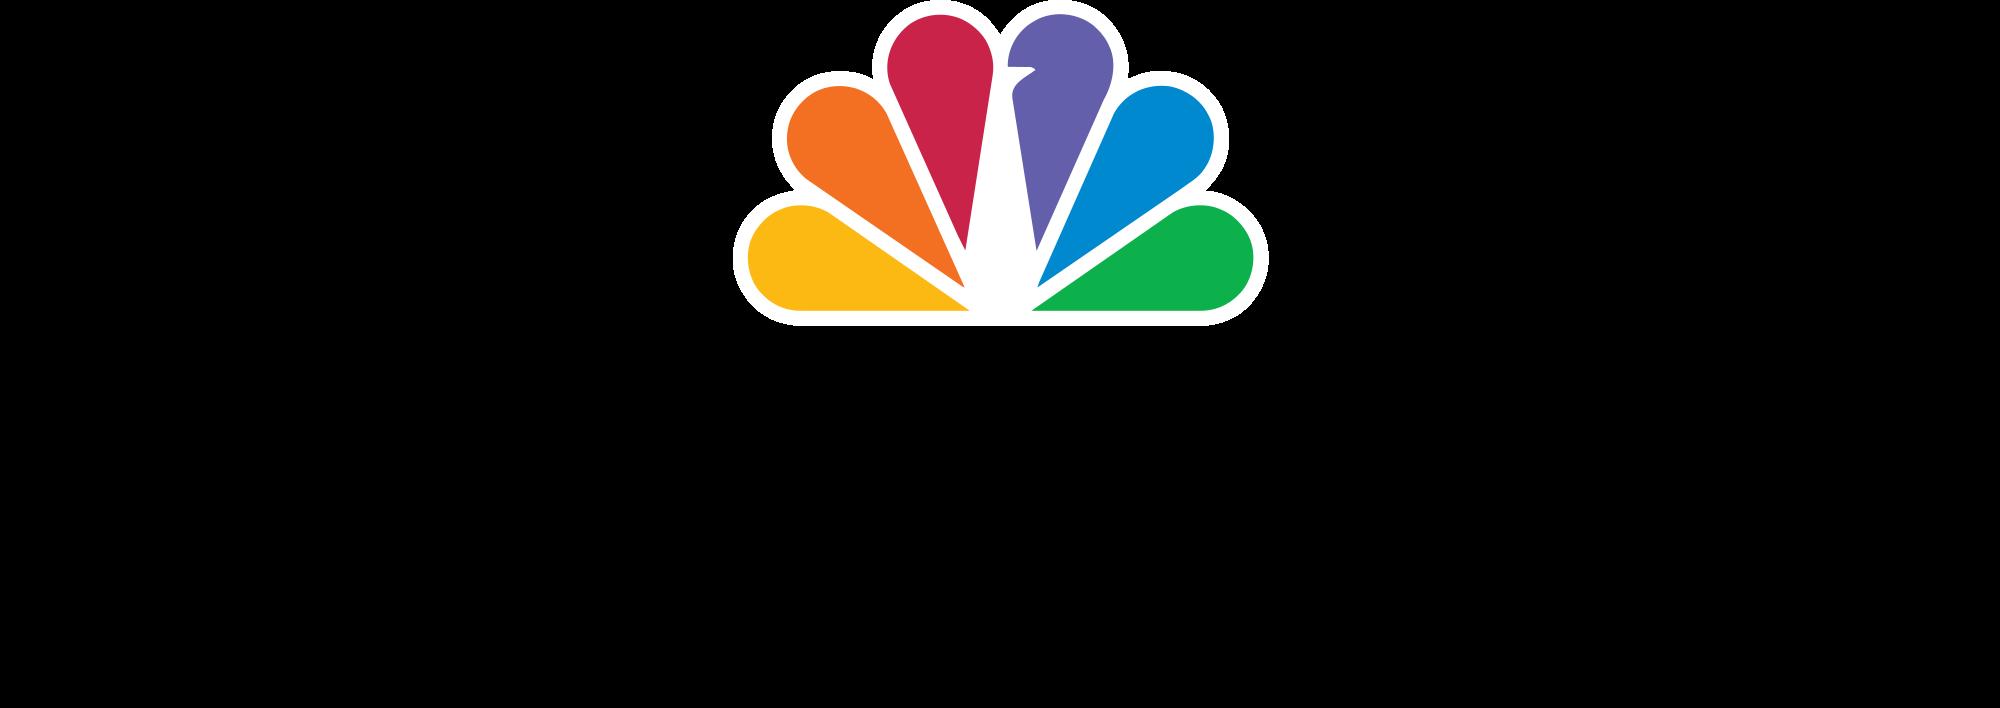 Image result for comcast logo